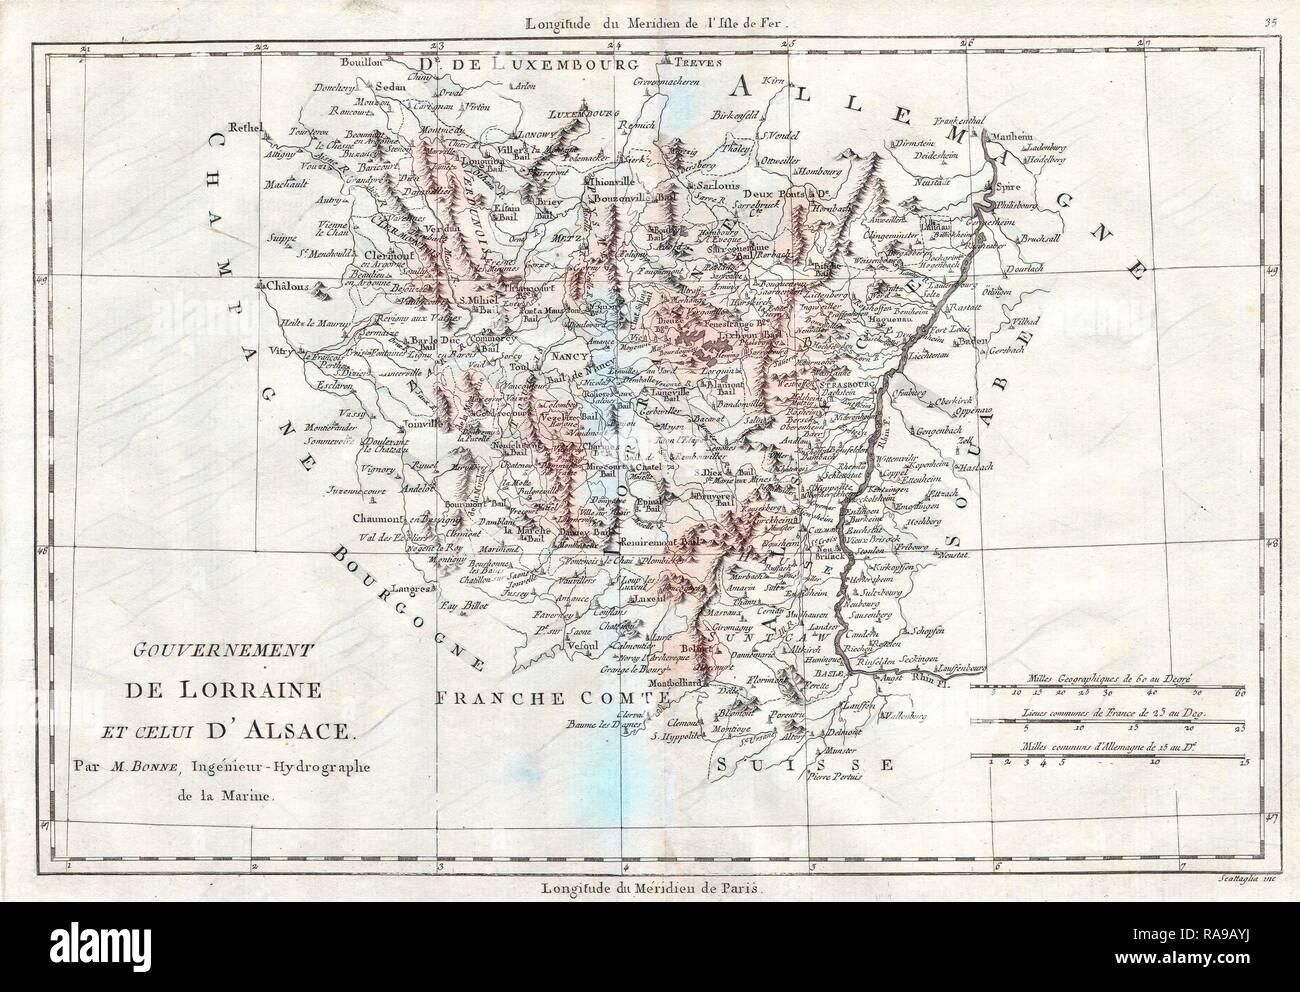 1780 Bonne Map Of Alsace And Lorainne France Rigobert Bonne 1727